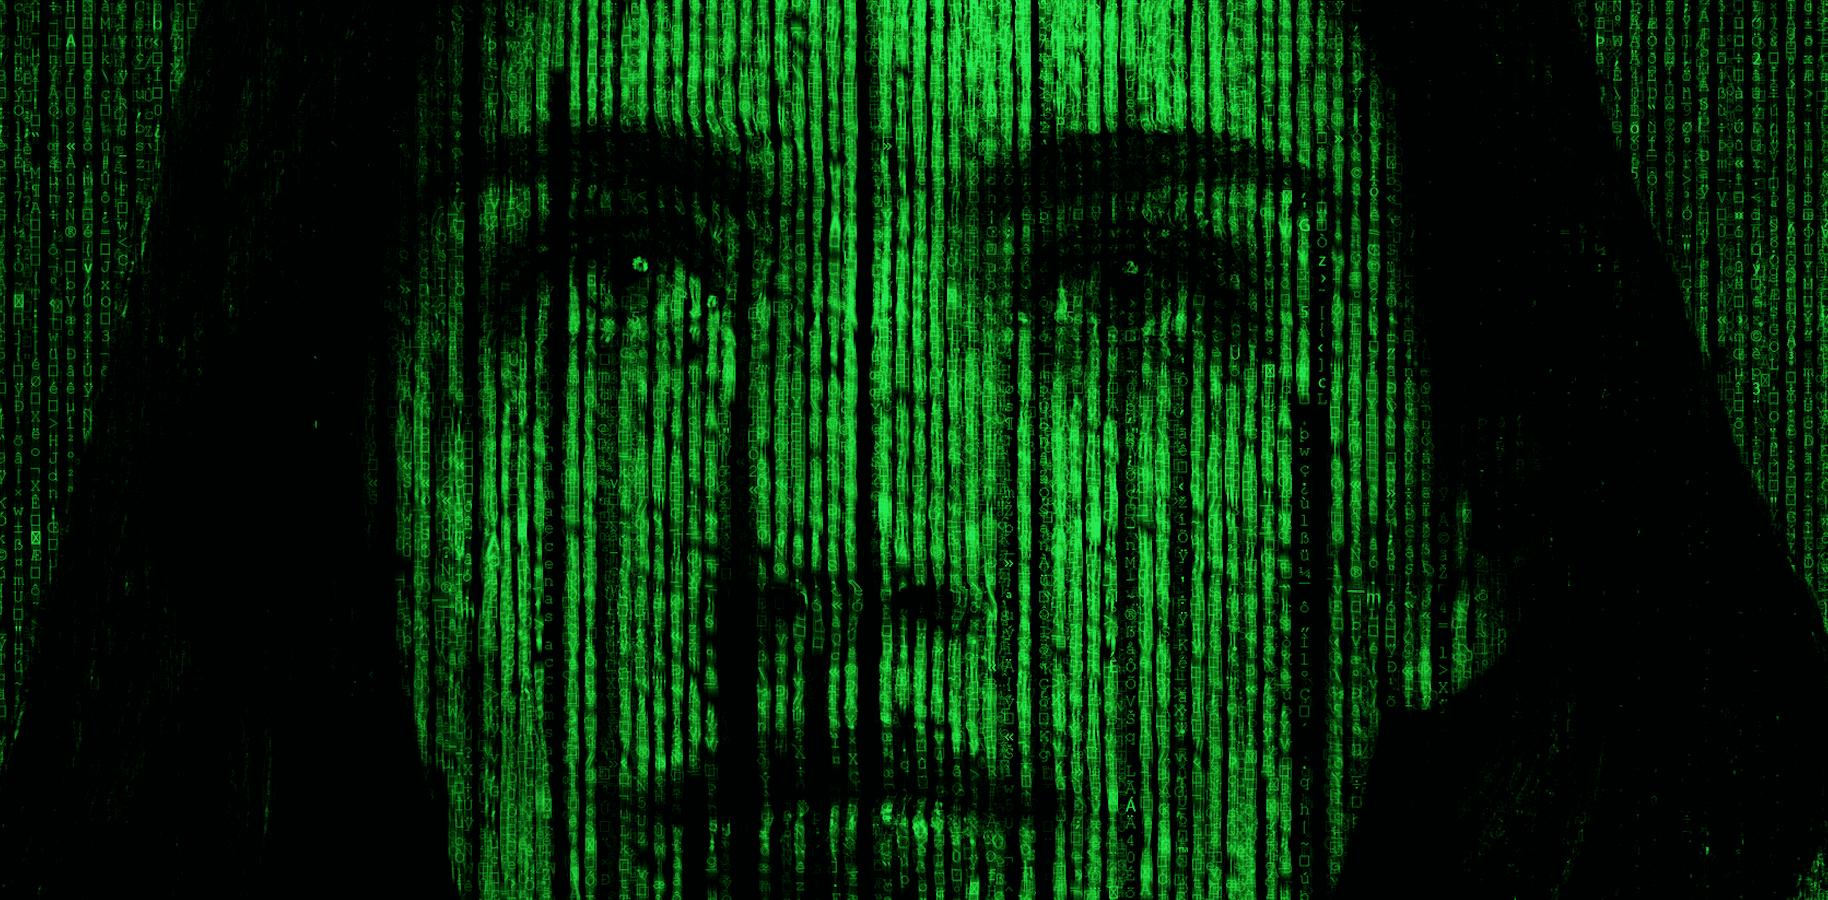 Organisational culture | Digital and AI